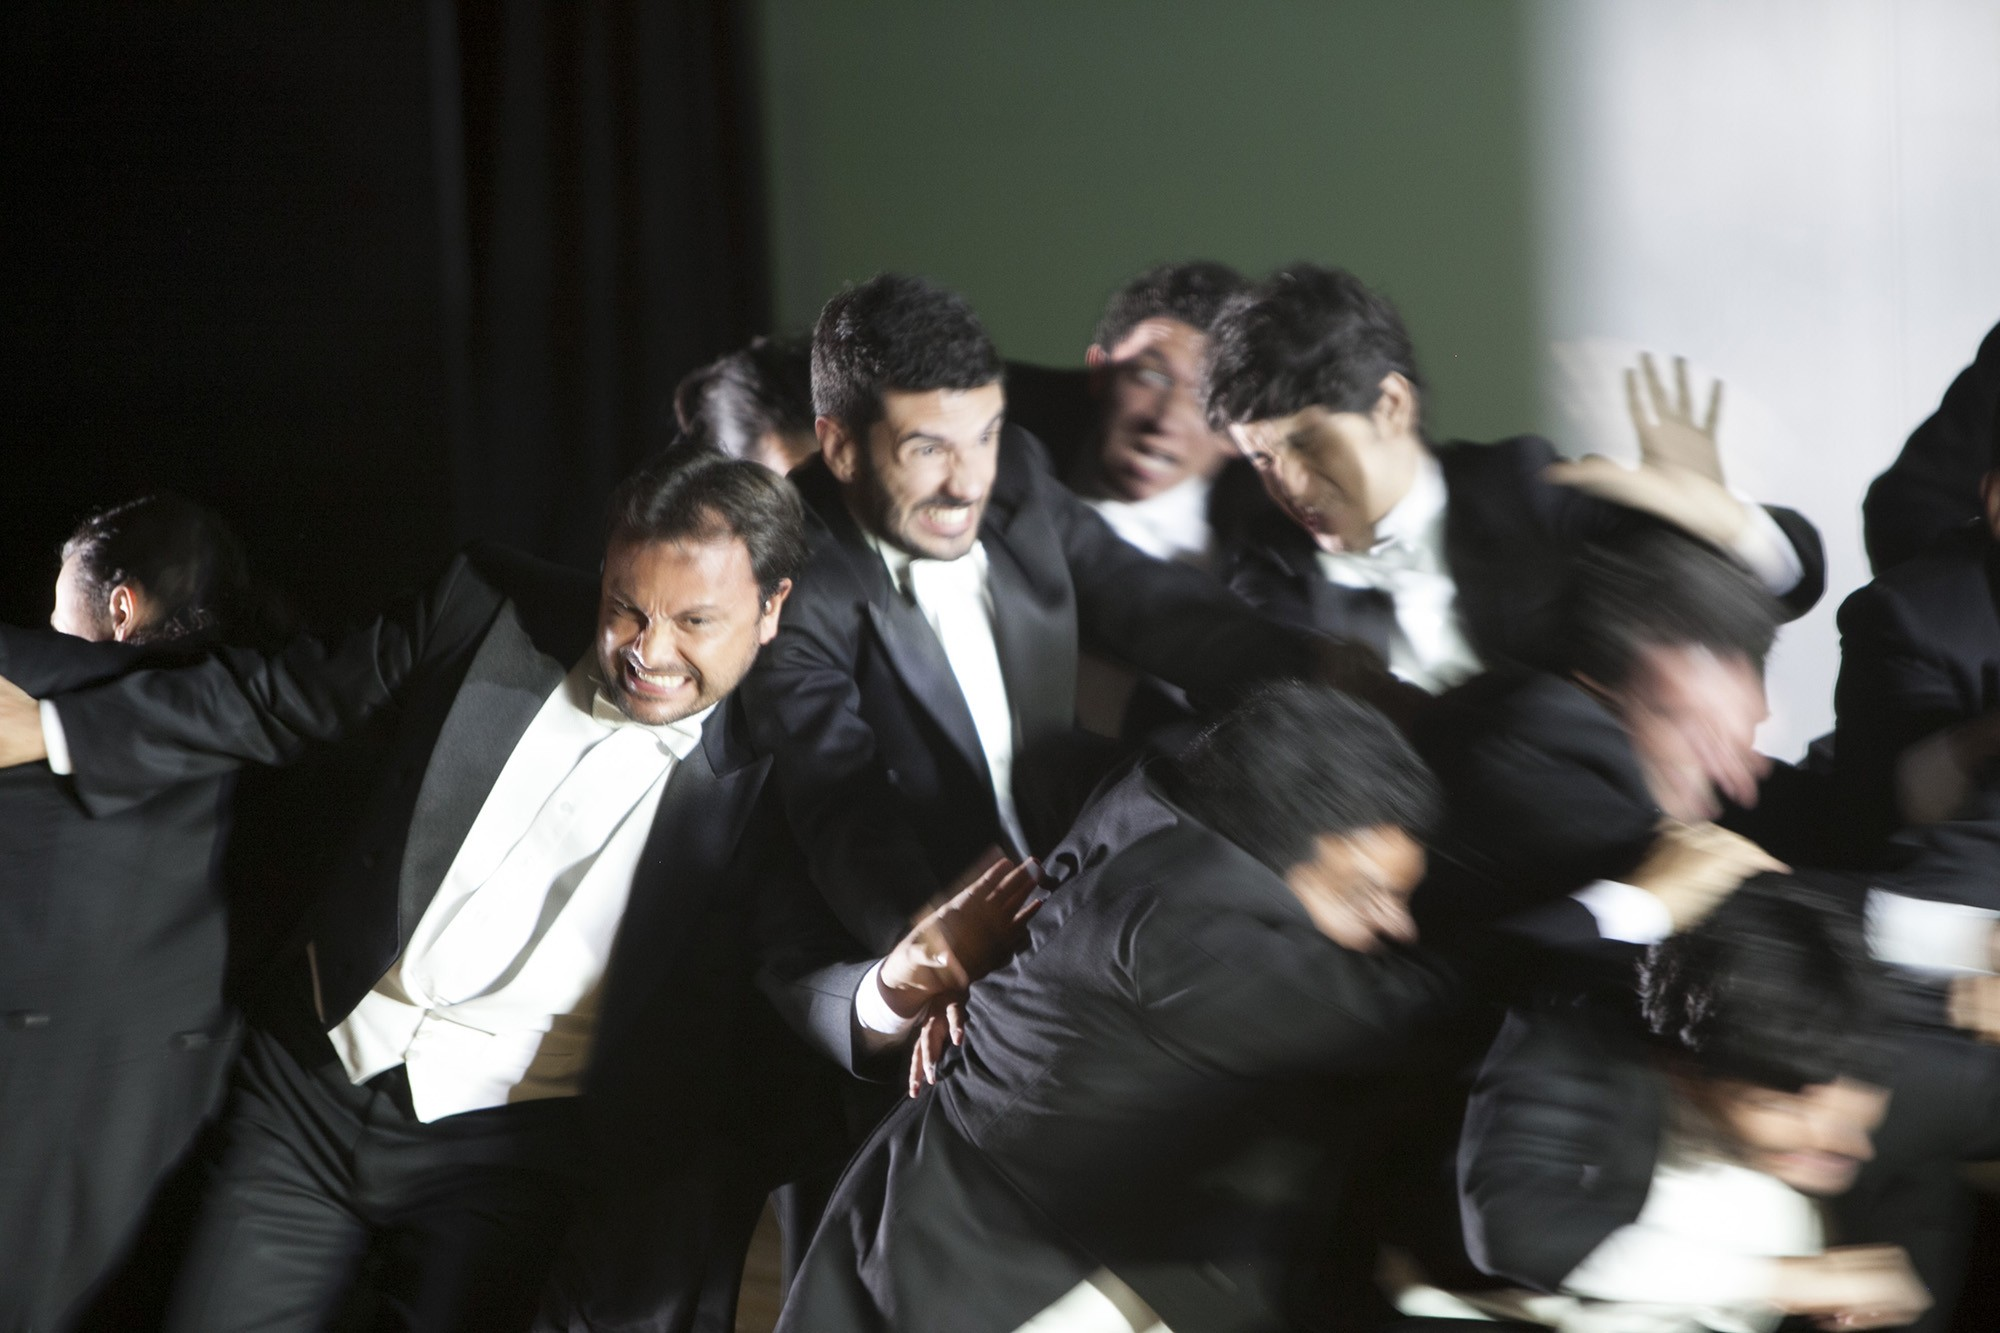 Cenerentola-Opera-directed-by-Jacopo-Spirei-1